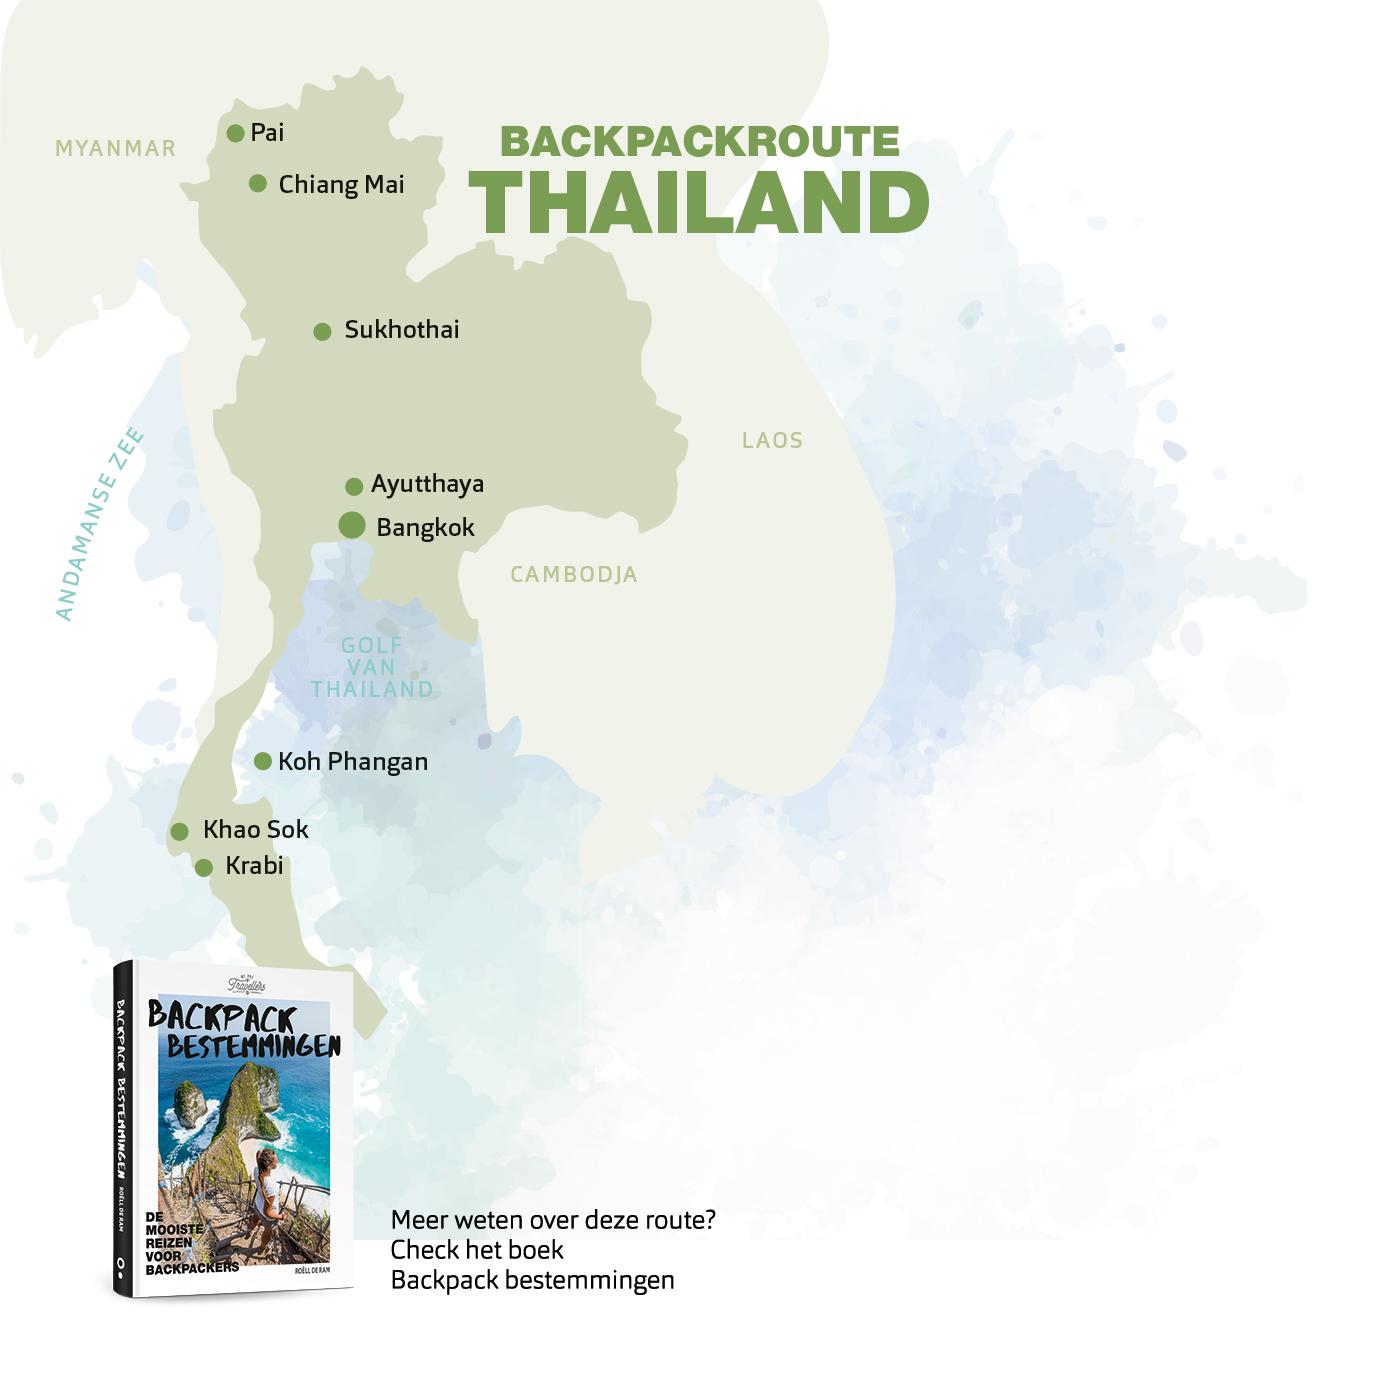 backpack route thailand boek backpack bestemmingen